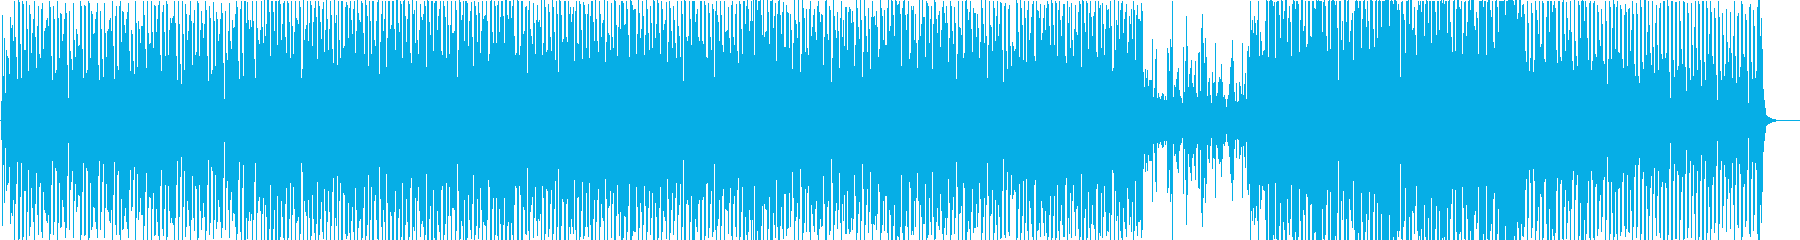 Onsen Holidayの再生済みの波形